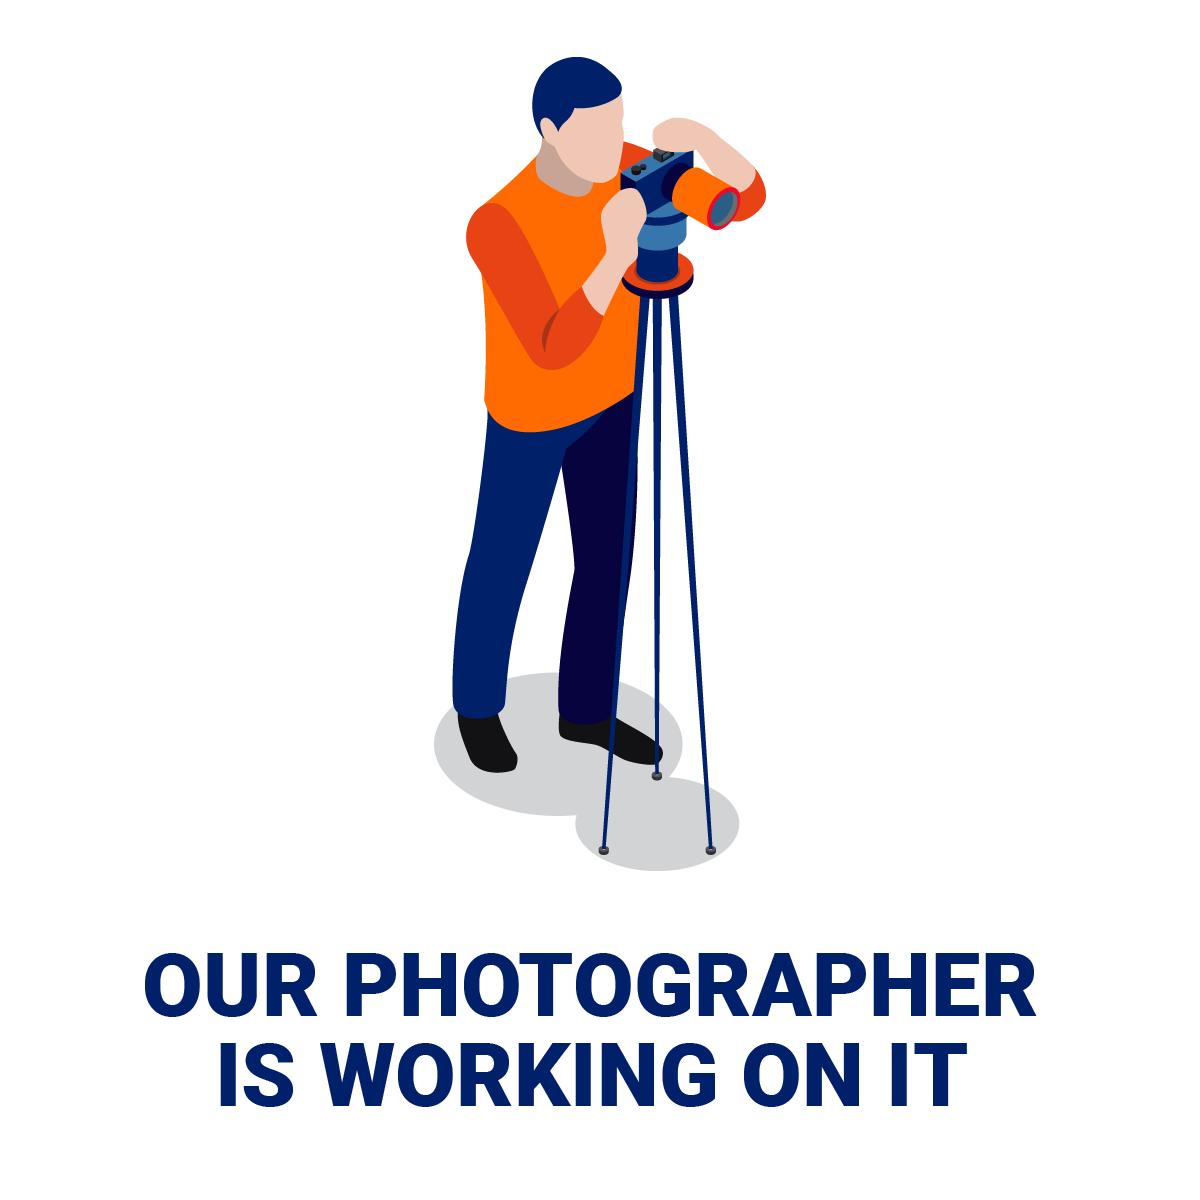 PK3RJ GPU 3